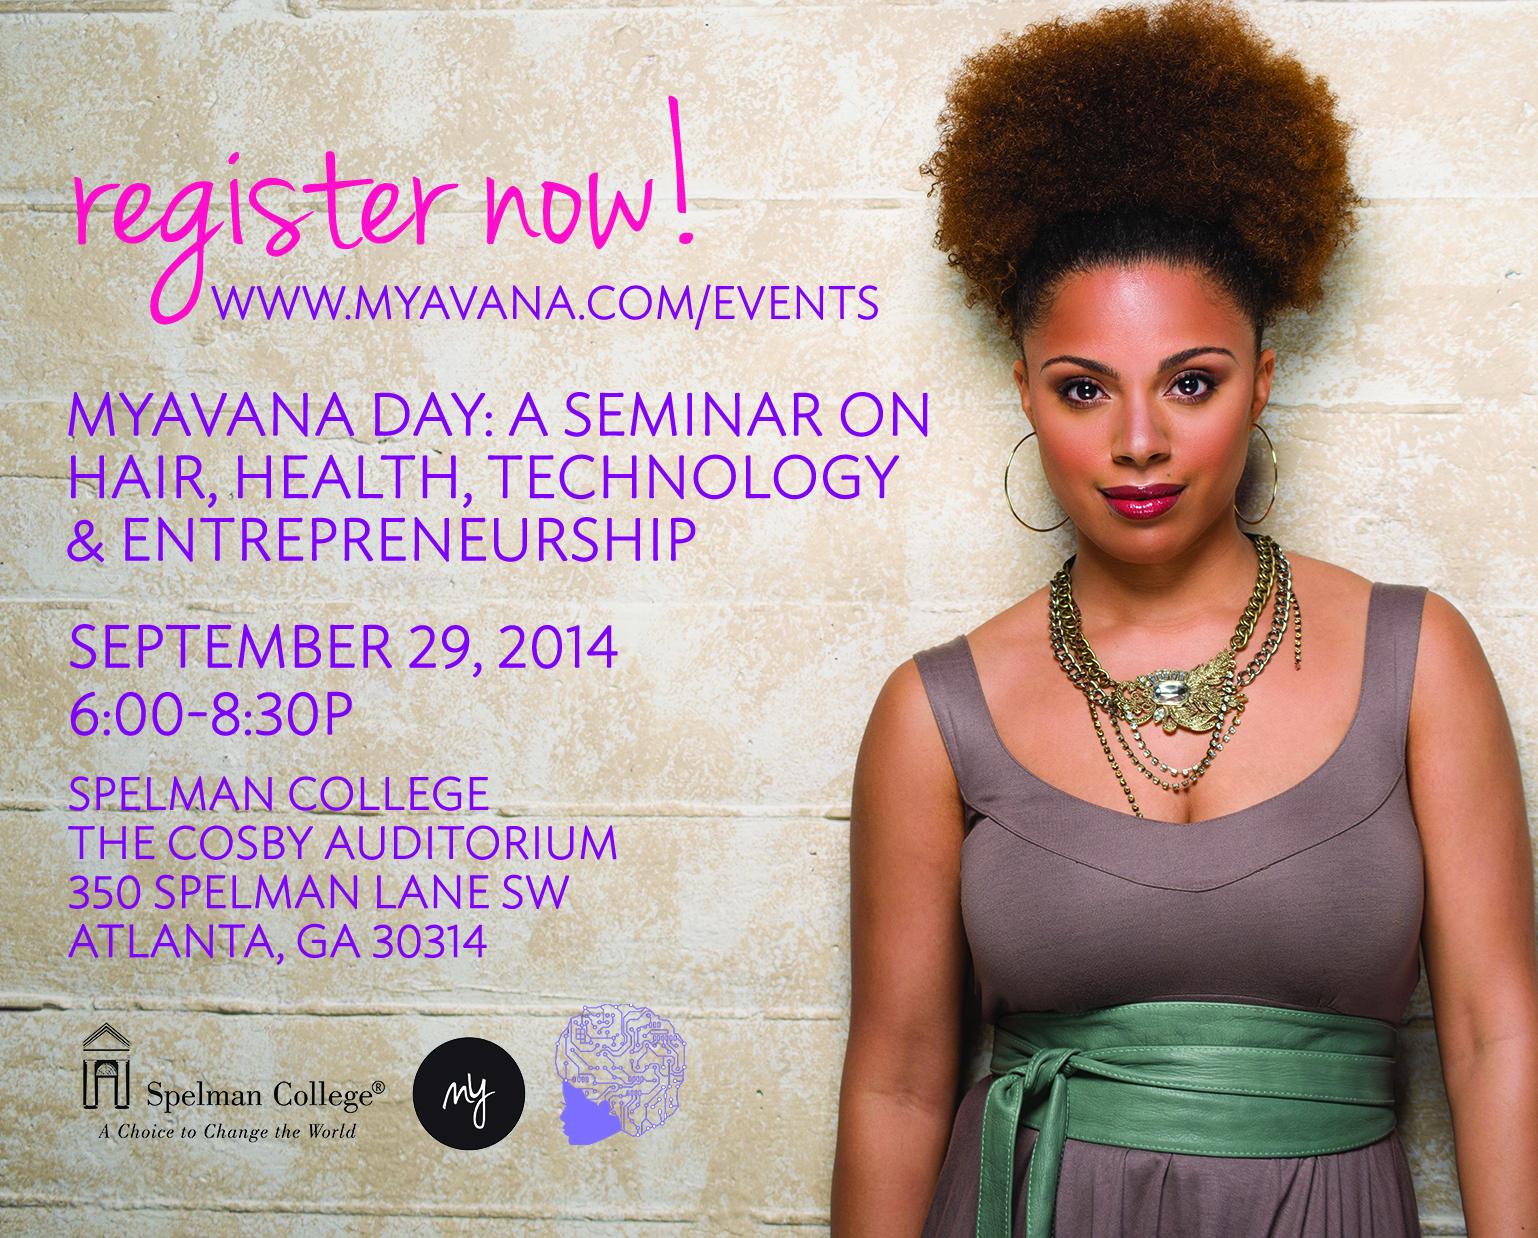 Myavana Day at Spelman College